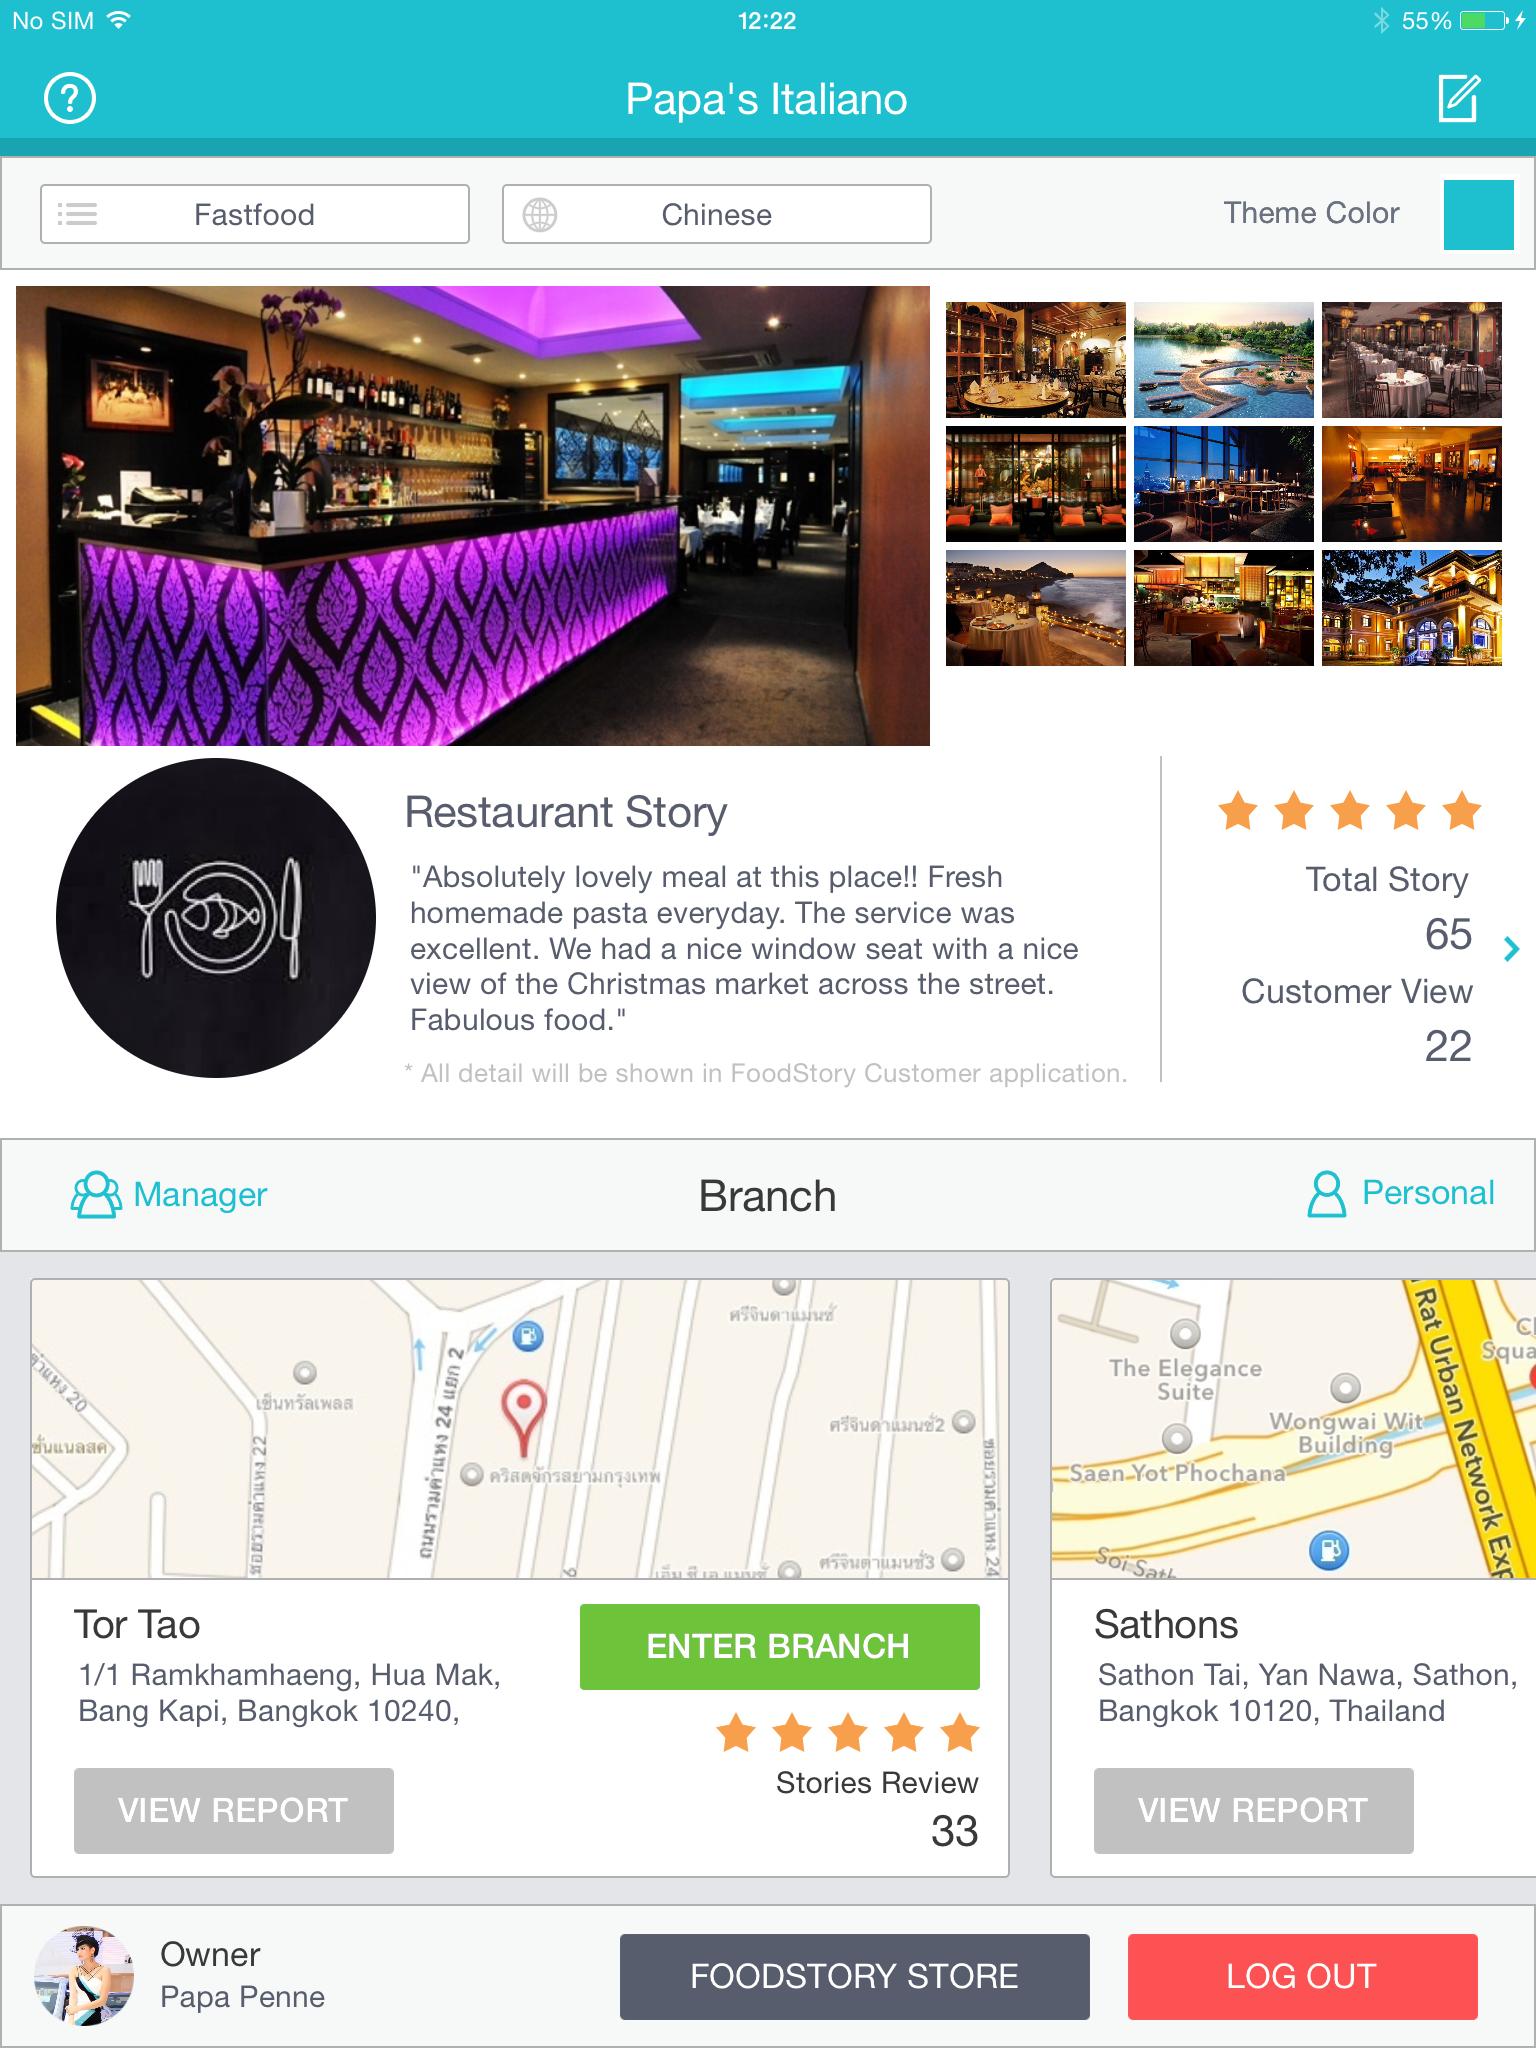 Restaurant Detail - รายละเอียดร้านอาหาร